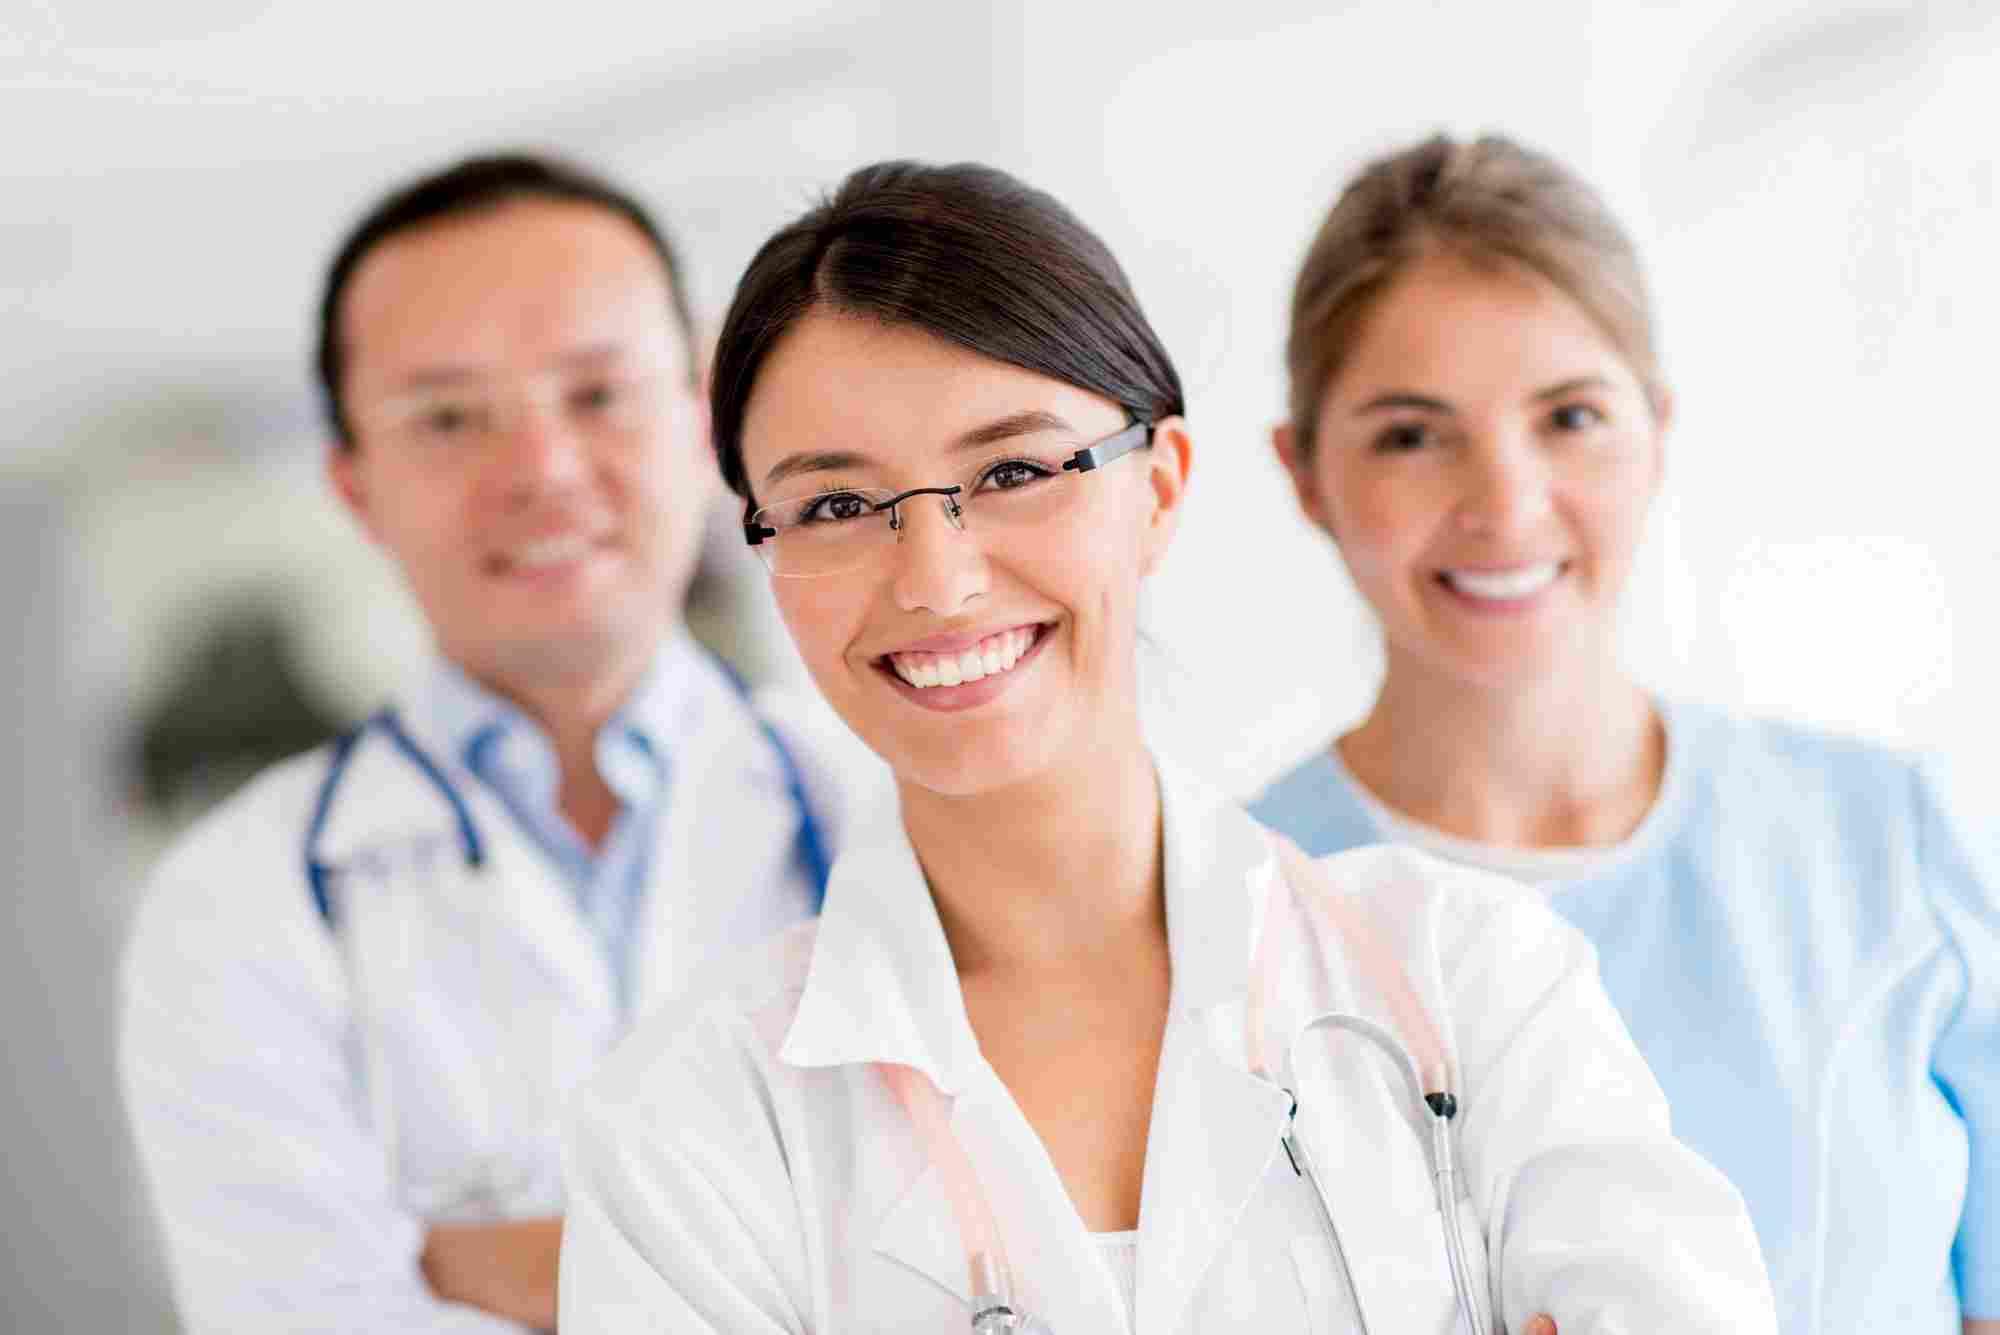 http://clinicarhinus.com.br/wp-content/uploads/2015/12/doctors.jpg